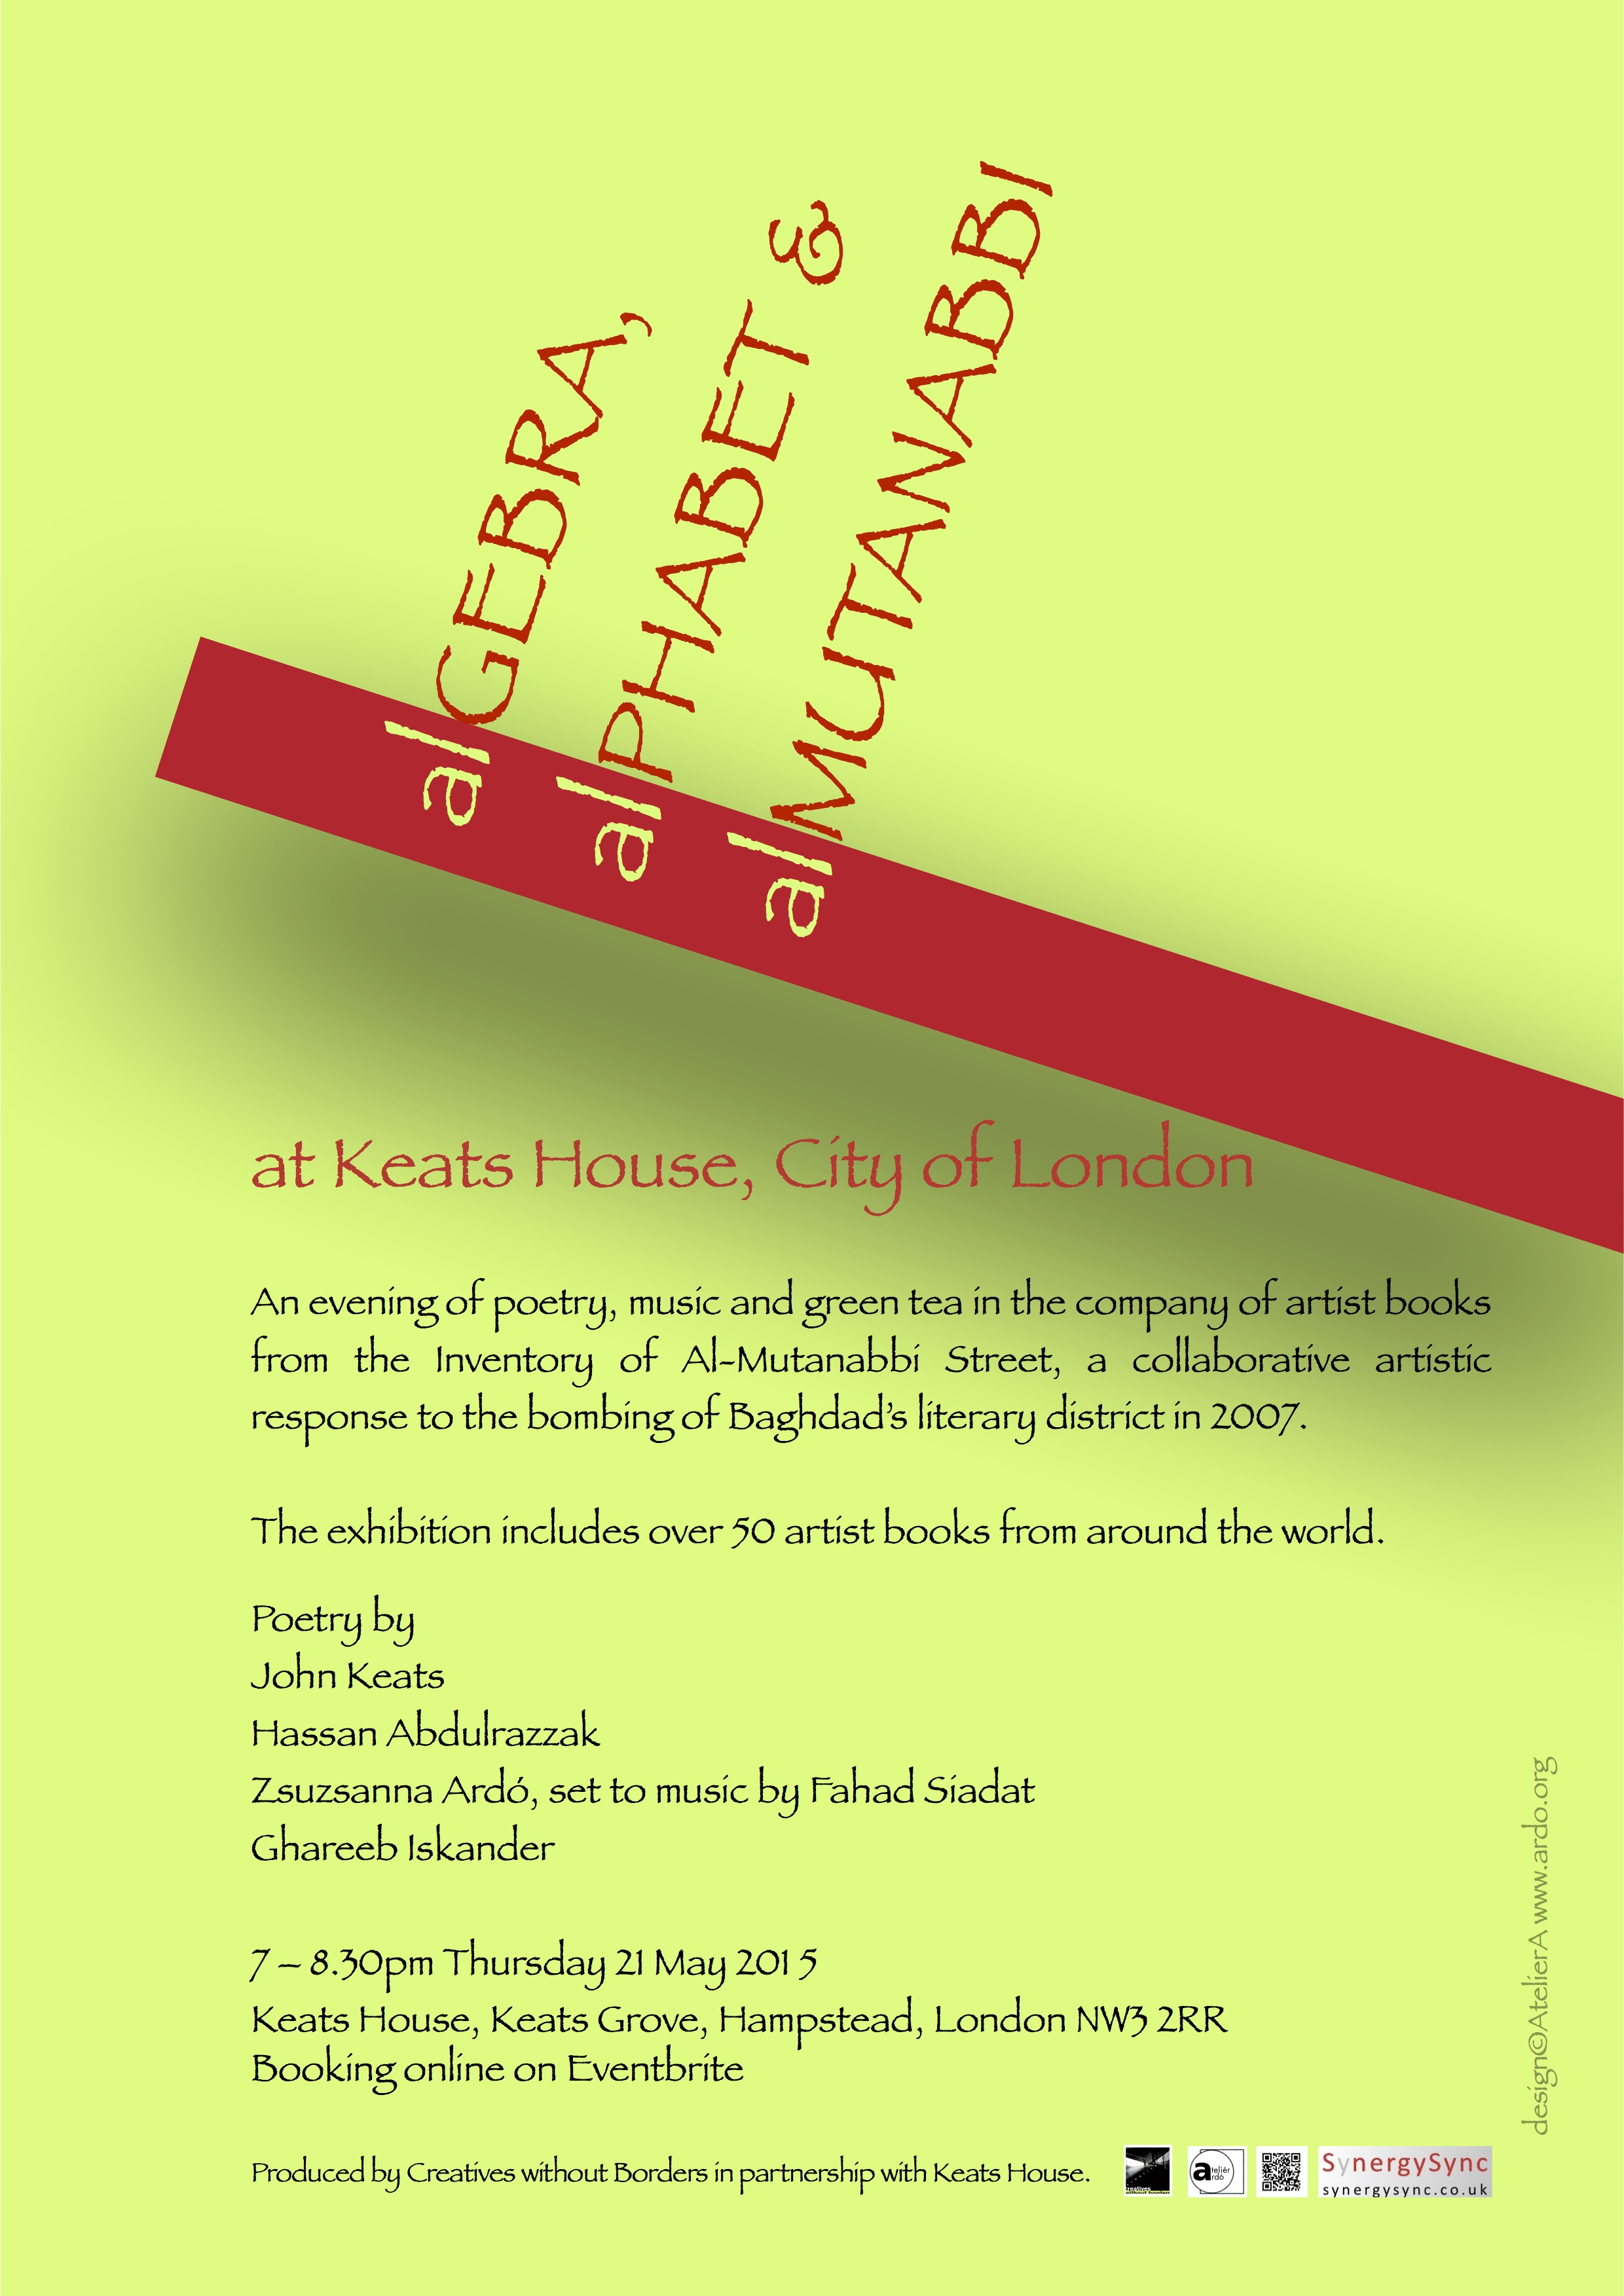 Keats house poster.jpg